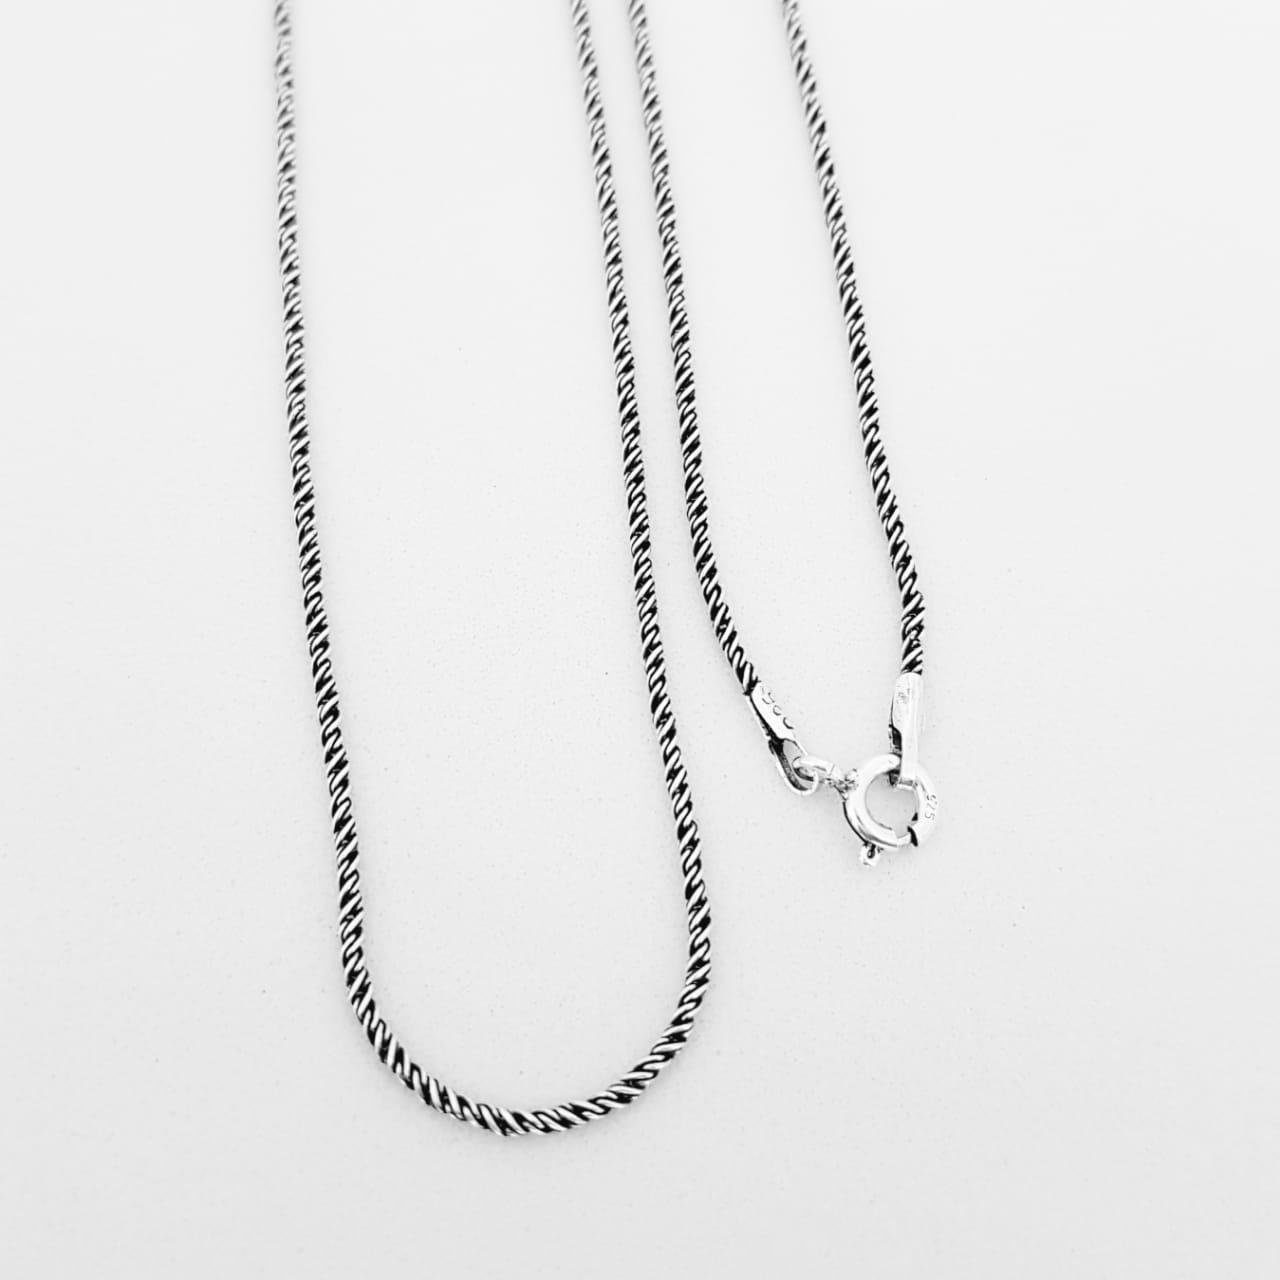 Corrente de Prata Trama Bali - 60 cm